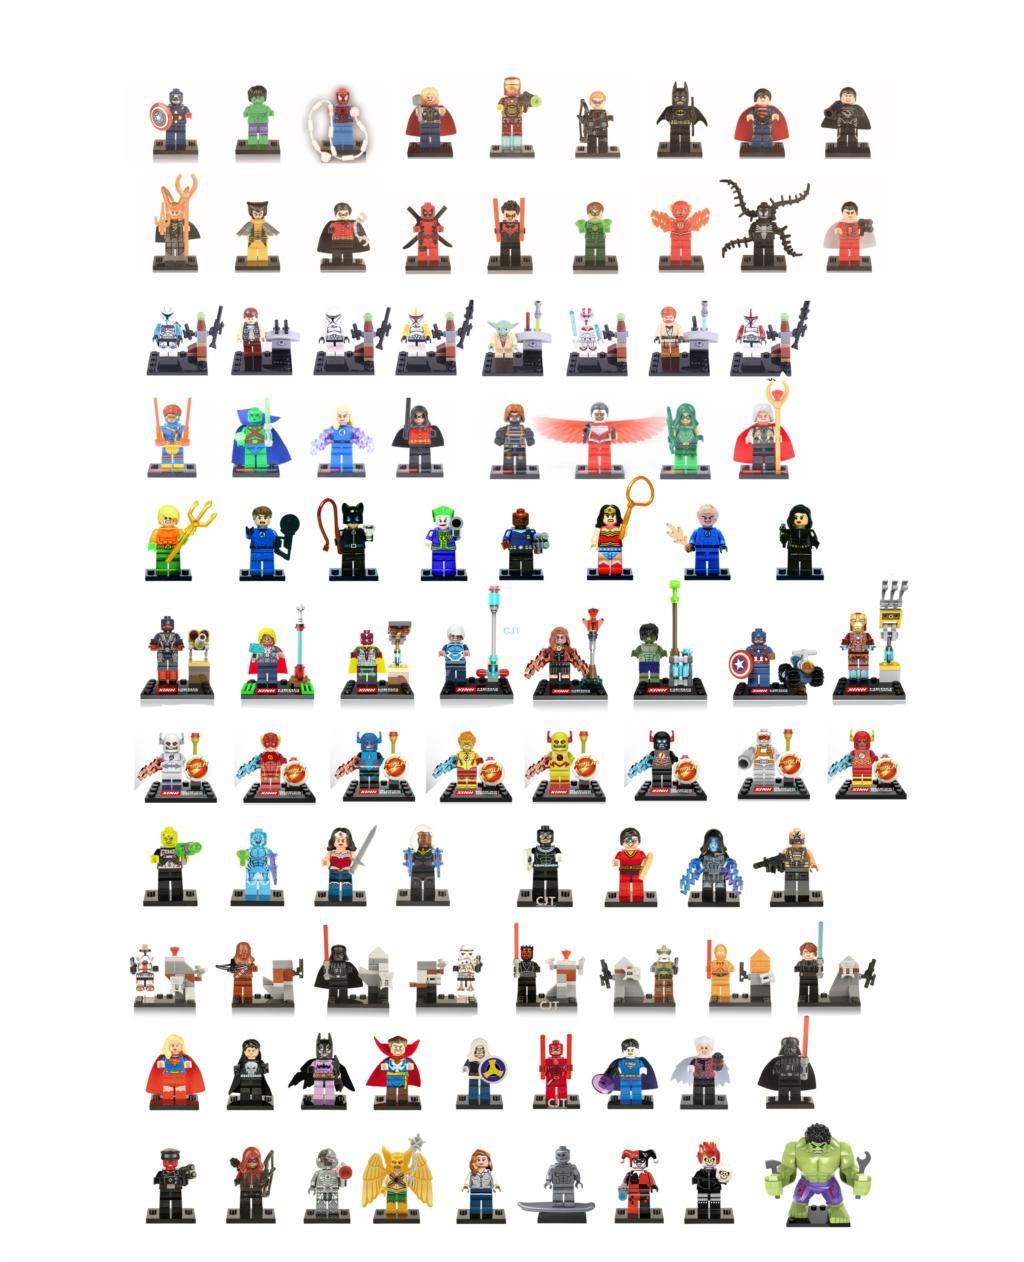 Lego Spiderman Malvorlagen Star Wars 1 Lego Spiderman: Spiderman Lego Promotion-Achetez Des Spiderman Lego